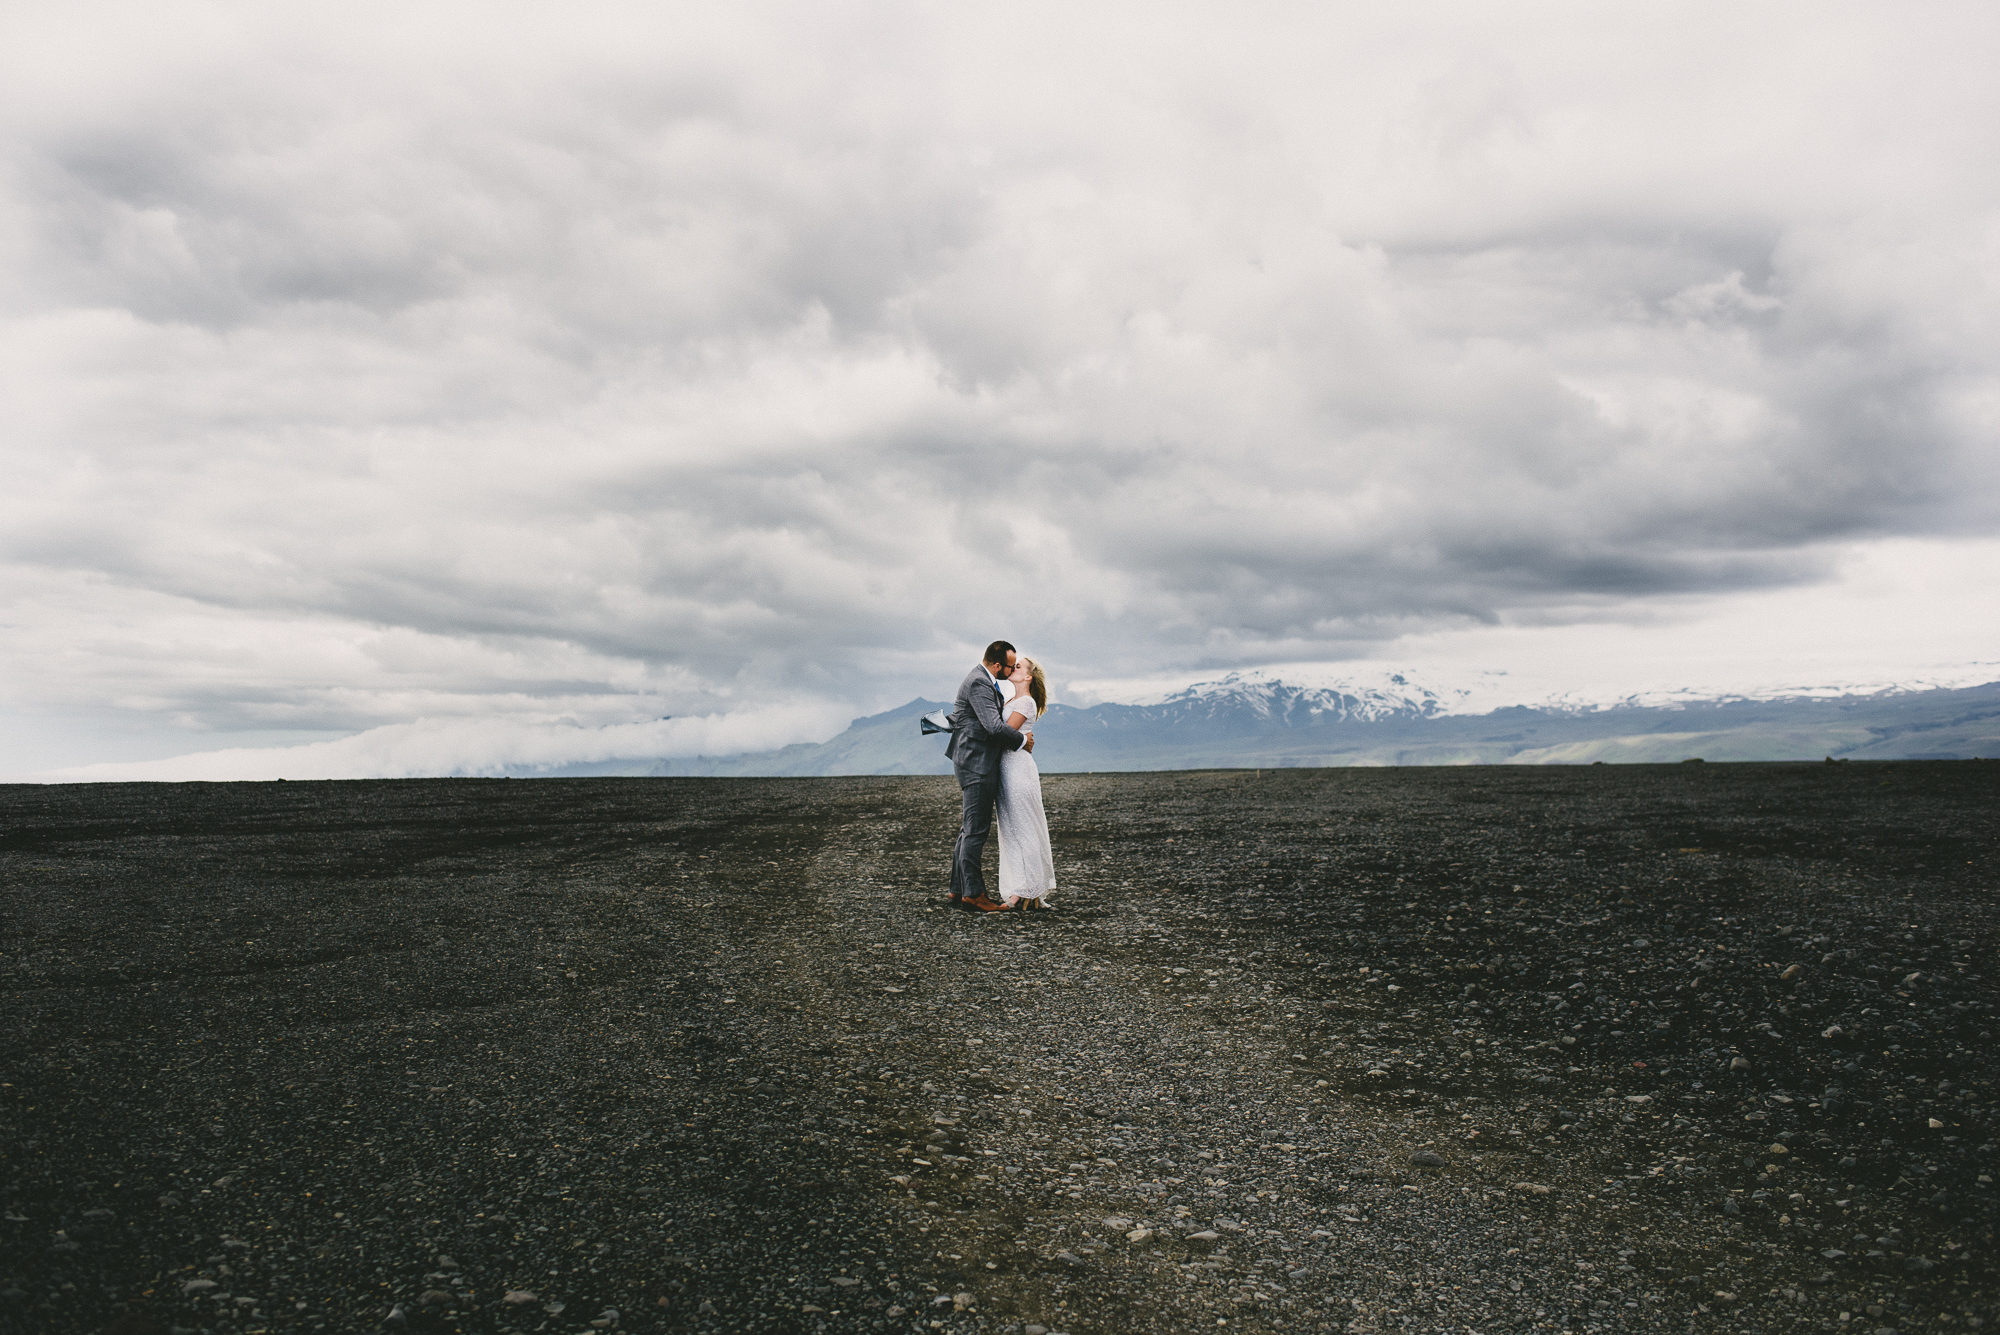 iceland-wedding-photographer-sara-rogers-photography-45.jpg